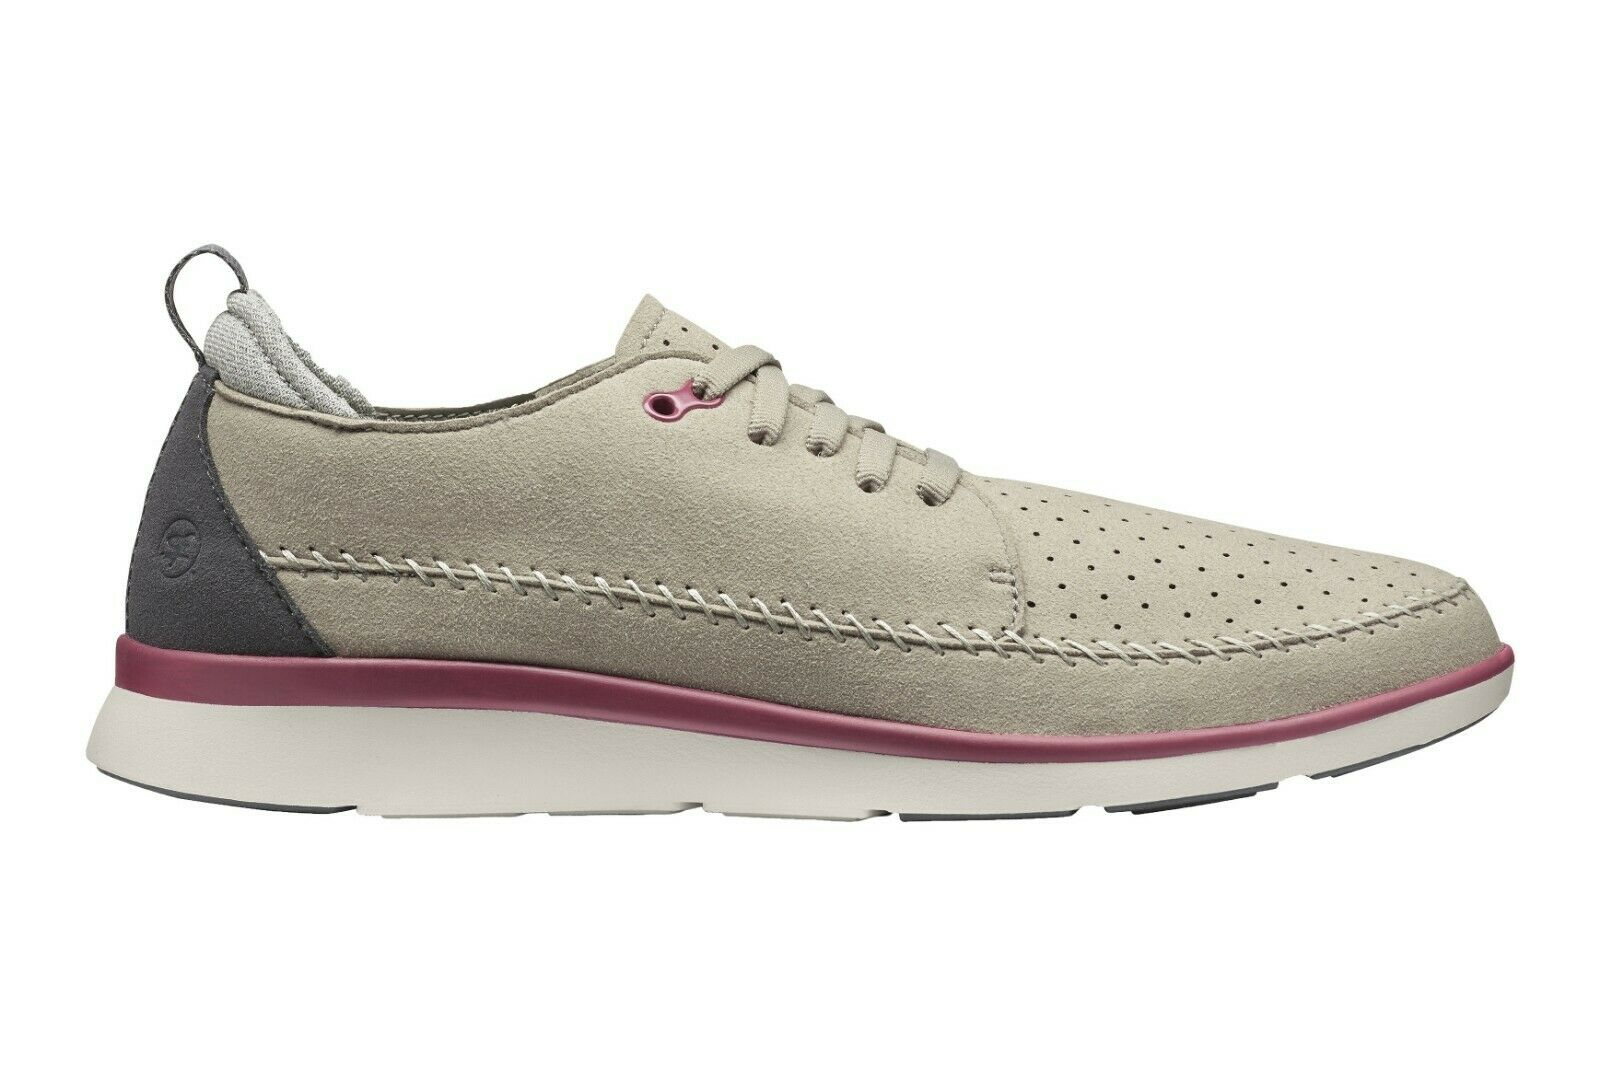 Superfeet CRANE Mens Cobblestone Lace Up Comfort Walking Sneaker shoes